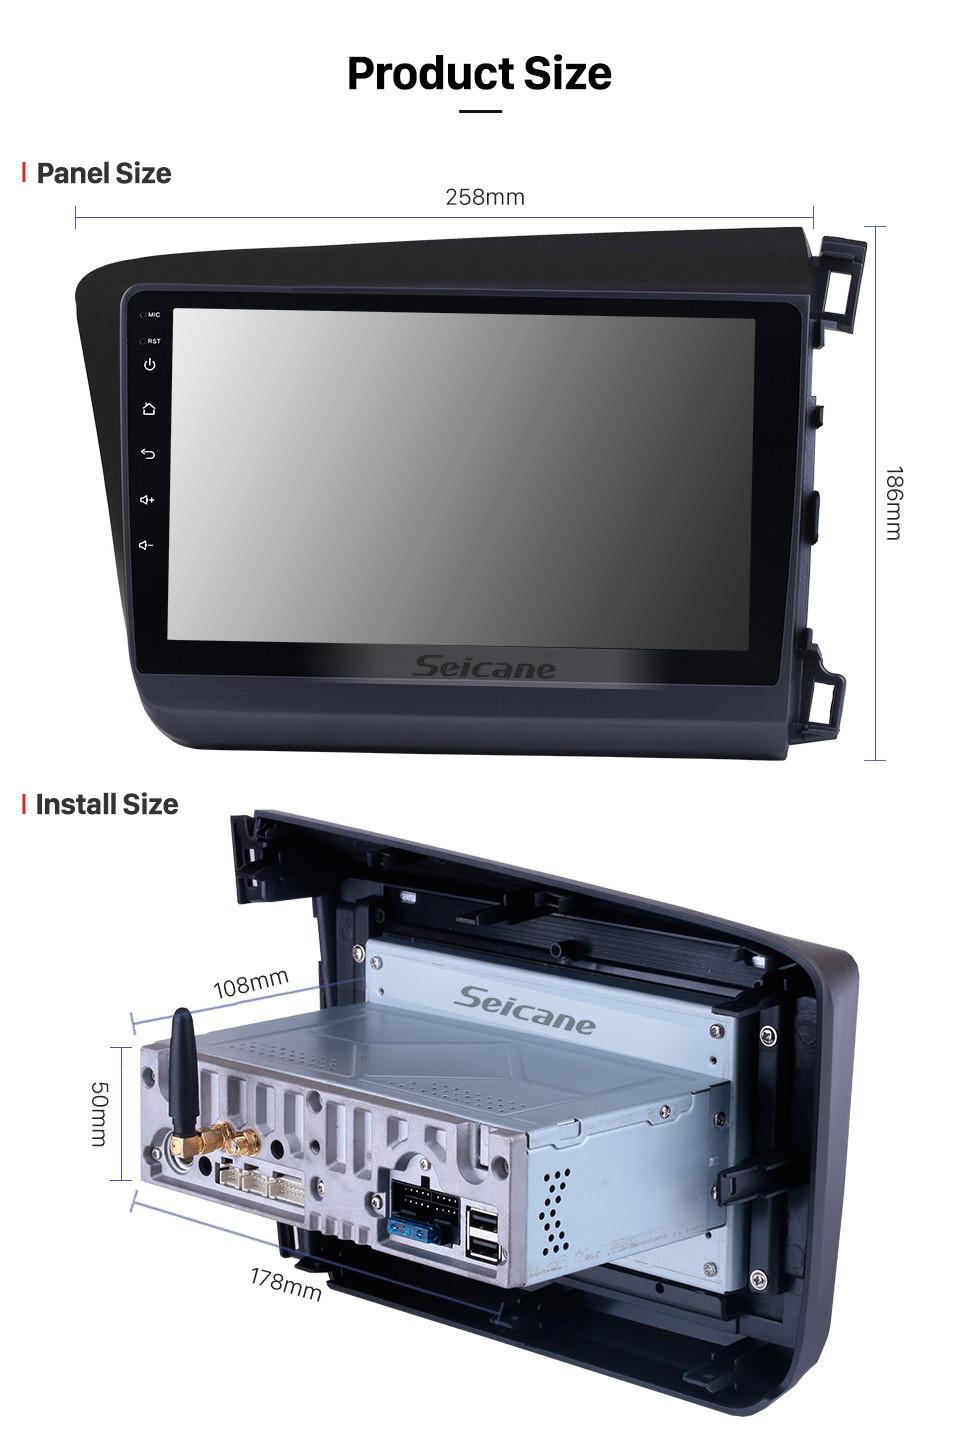 Seicane Android 10.0 HD Touchscreen 9 inch Radio GPS Navigation For 2012 Honda Civic RHD Steering Wheel Control Bluetooth Wifi FM support OBD2 DVR